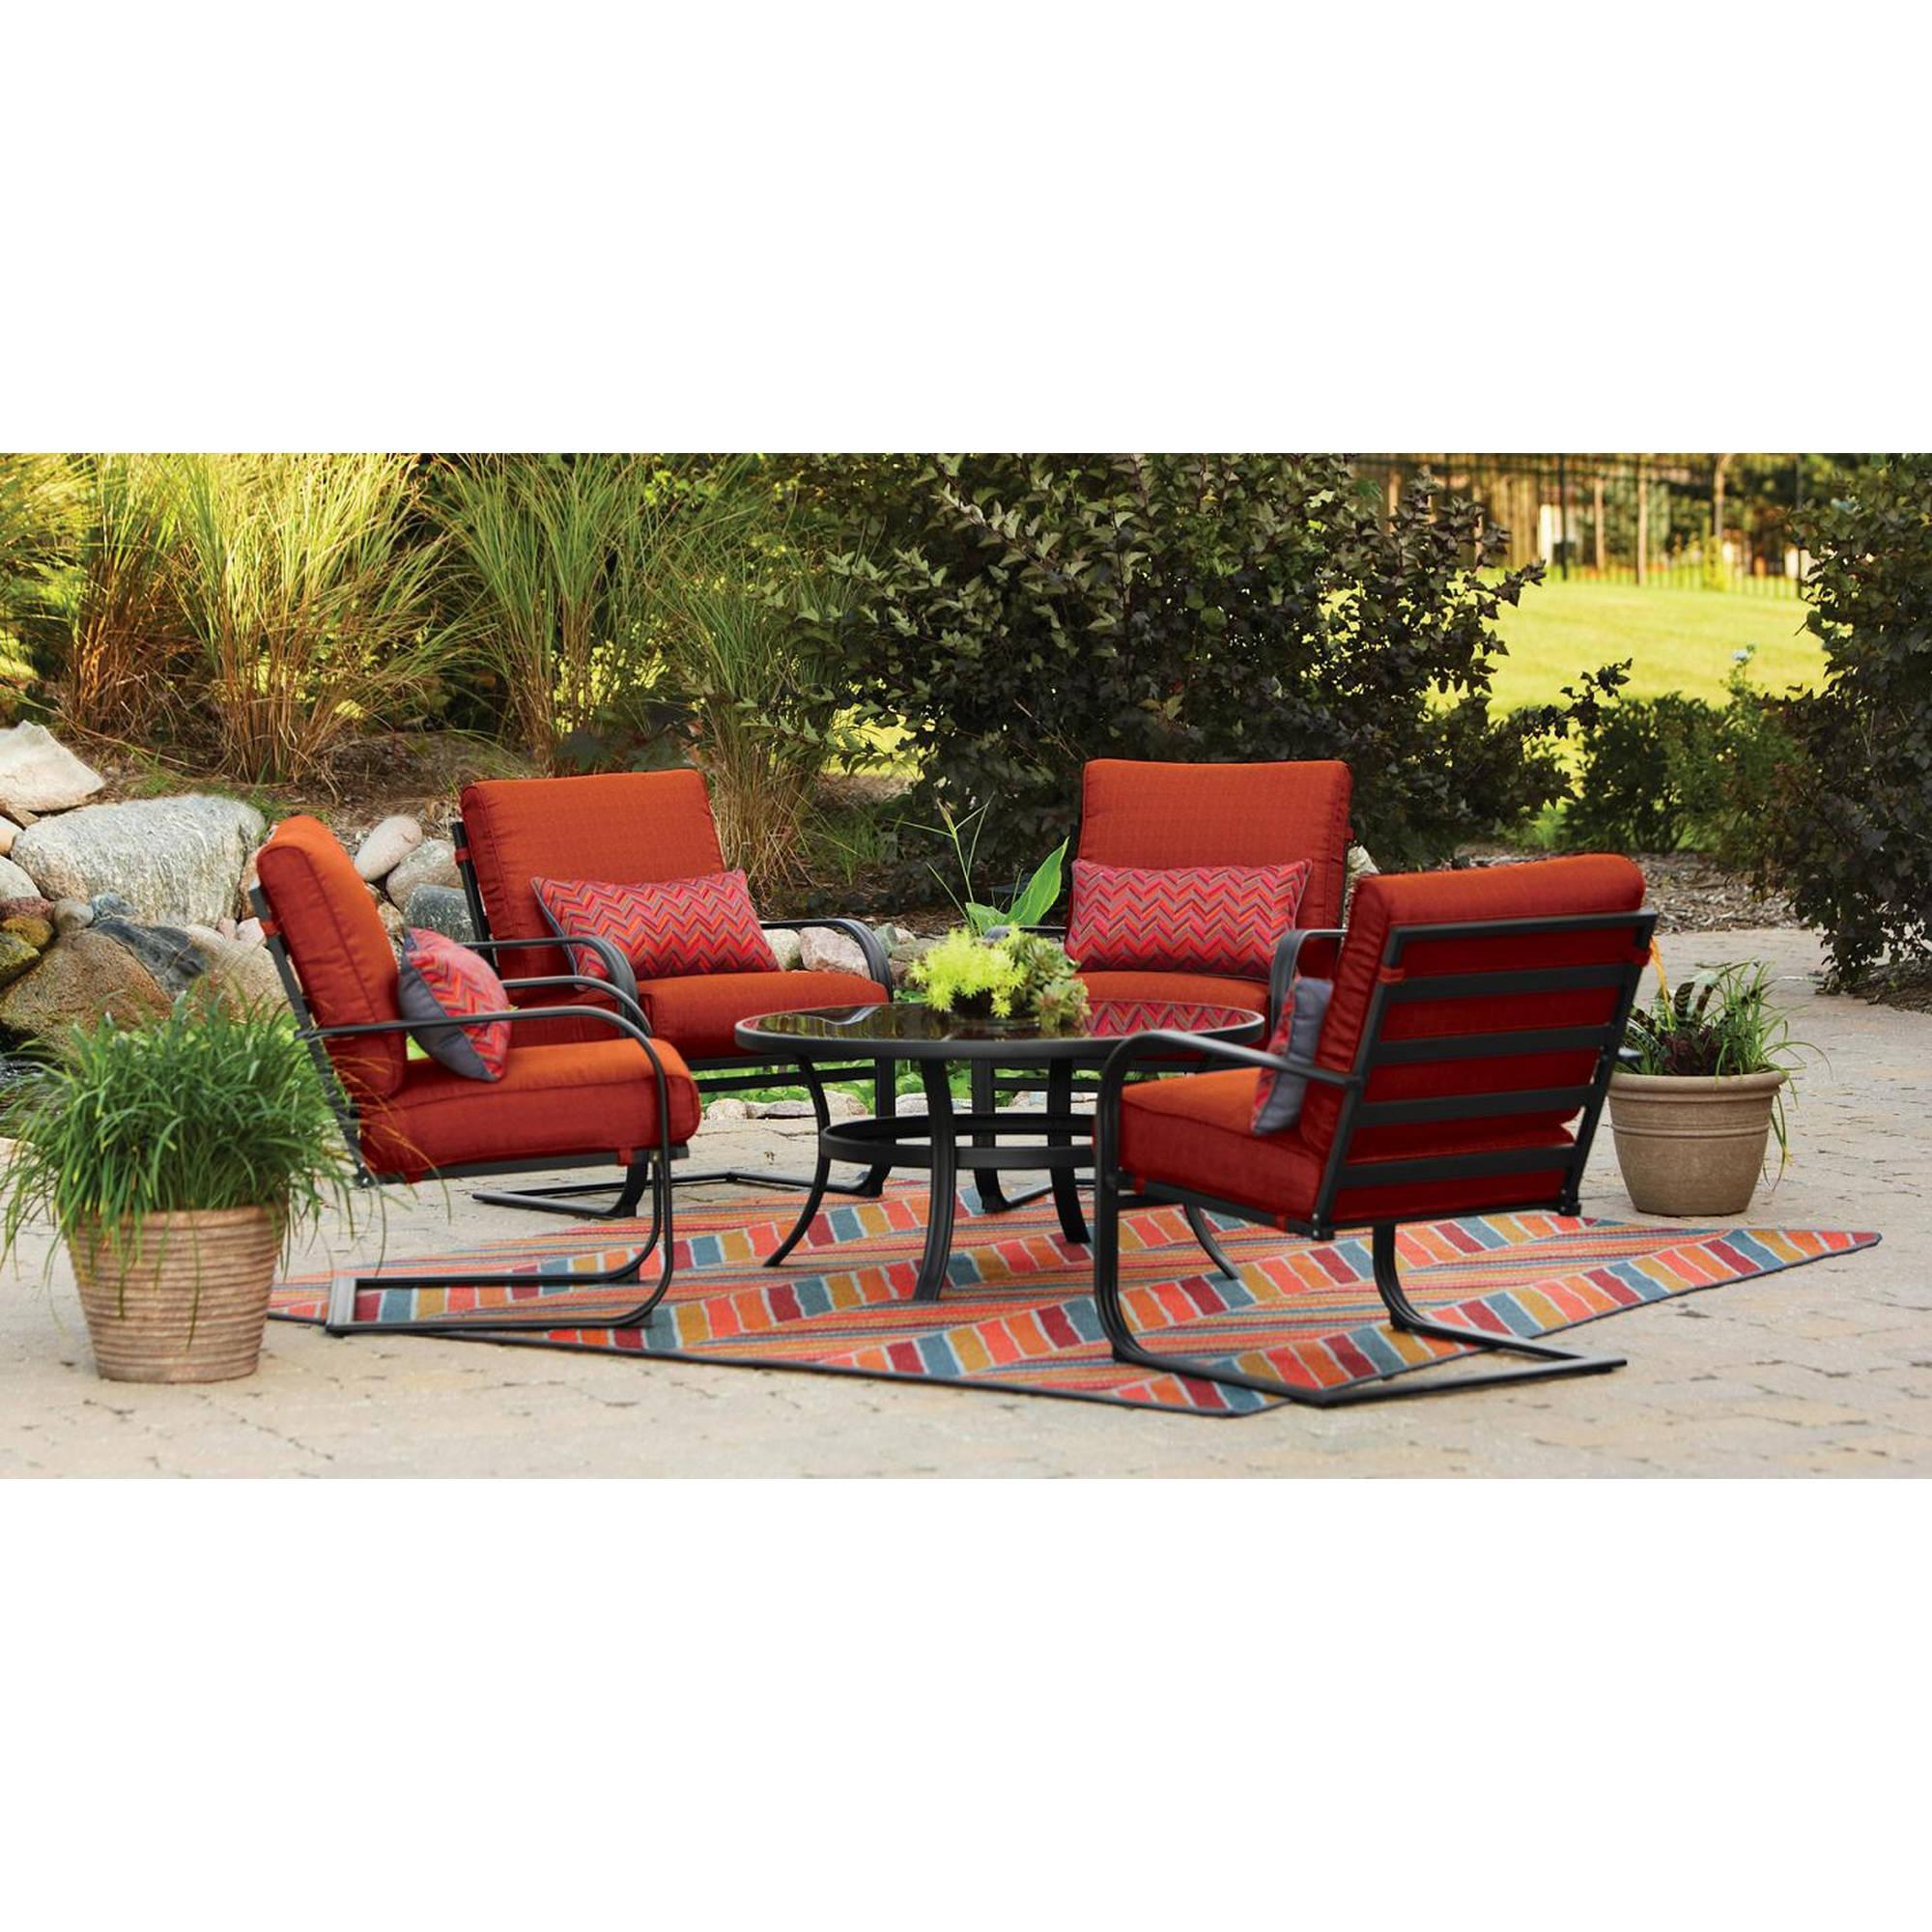 set patio piece sectional modern of furniture sofa beliani wicker gartenmobel conversation crema outdoor with